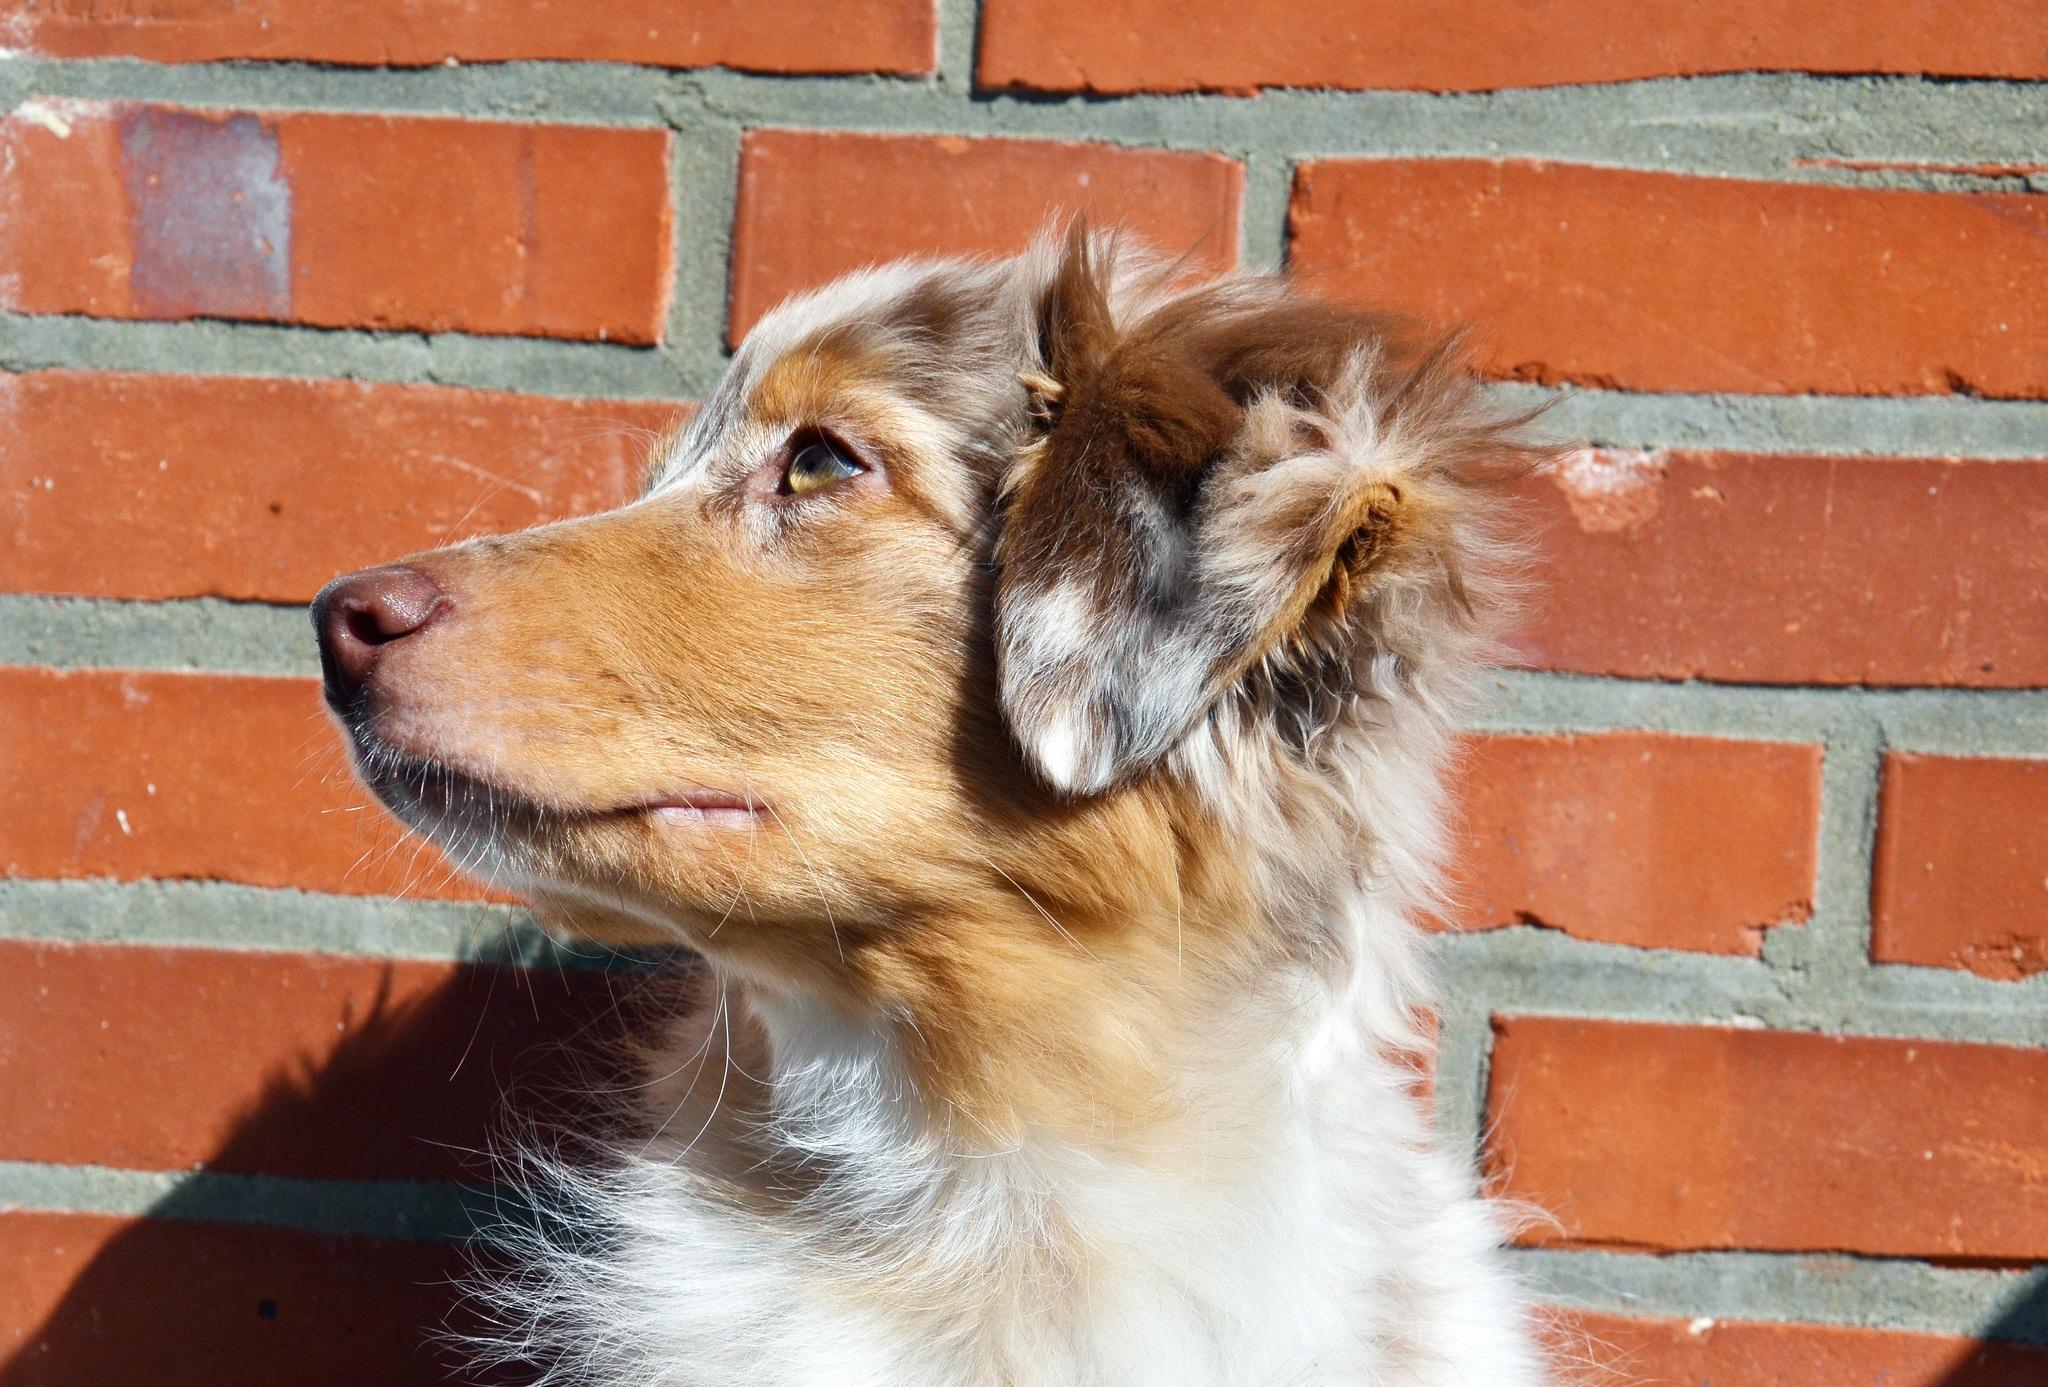 Best Fur Brown Adorable Dog - white-puppy-dog-animal-cute-canine-looking-collie-pet-fur-portrait-coat-young-small-brown-mammal-shepherd-border-collie-vertebrate-western-domestic-adorable-carnivore-dog-breed-breed-doggy-purebred-pedigree-australian-shepherd-pedigreed-street-dog-shetland-sheepdog-dog-like-mammal-carnivoran-dog-breed-group-miniature-australian-shepherd-rough-collie-scotch-collie-yuna-773919  Gallery_661017  .jpg